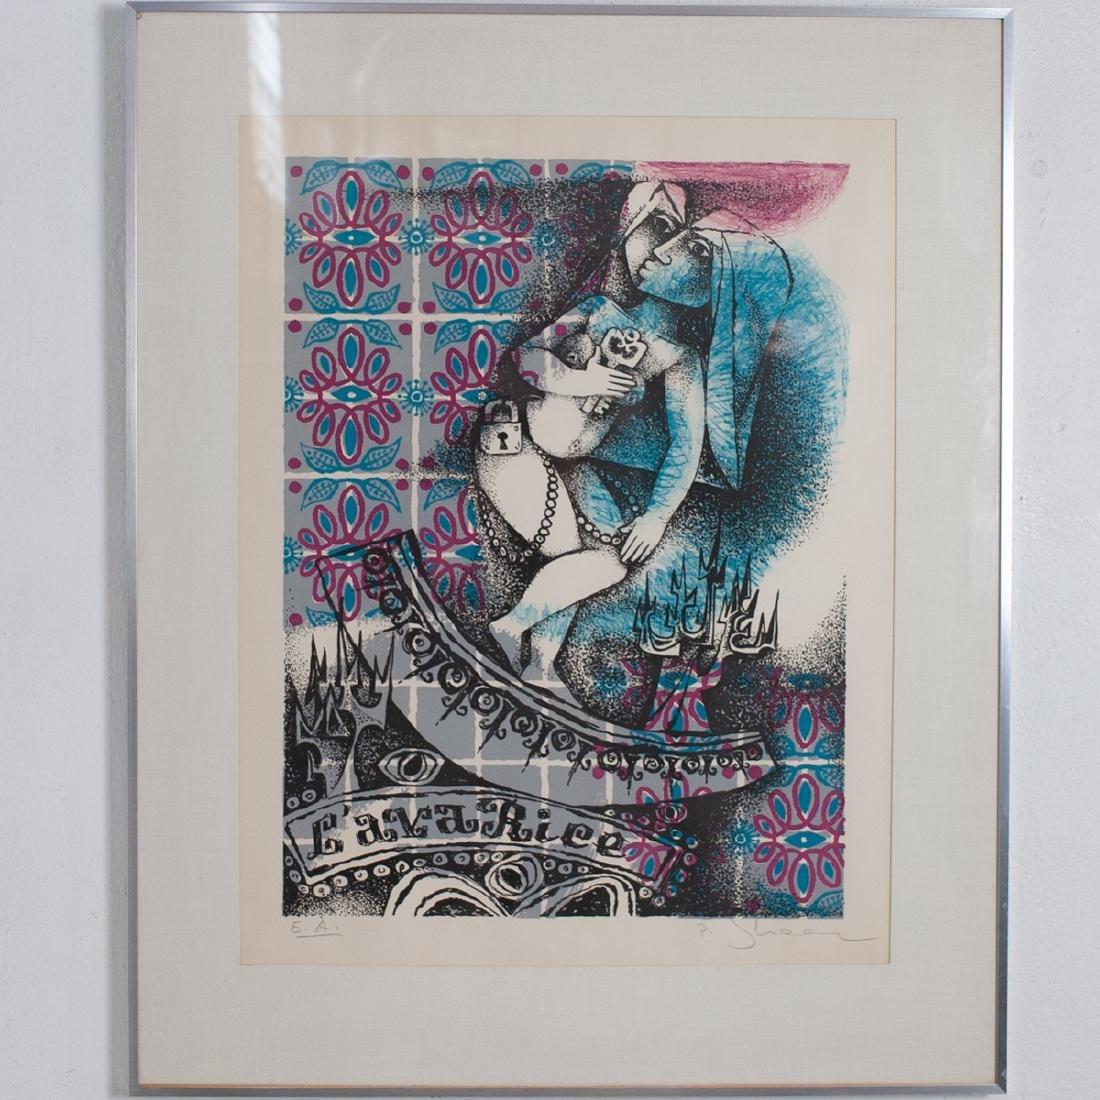 Pinchas Shaar (Israeli 1923 - 1996) Artist Proof